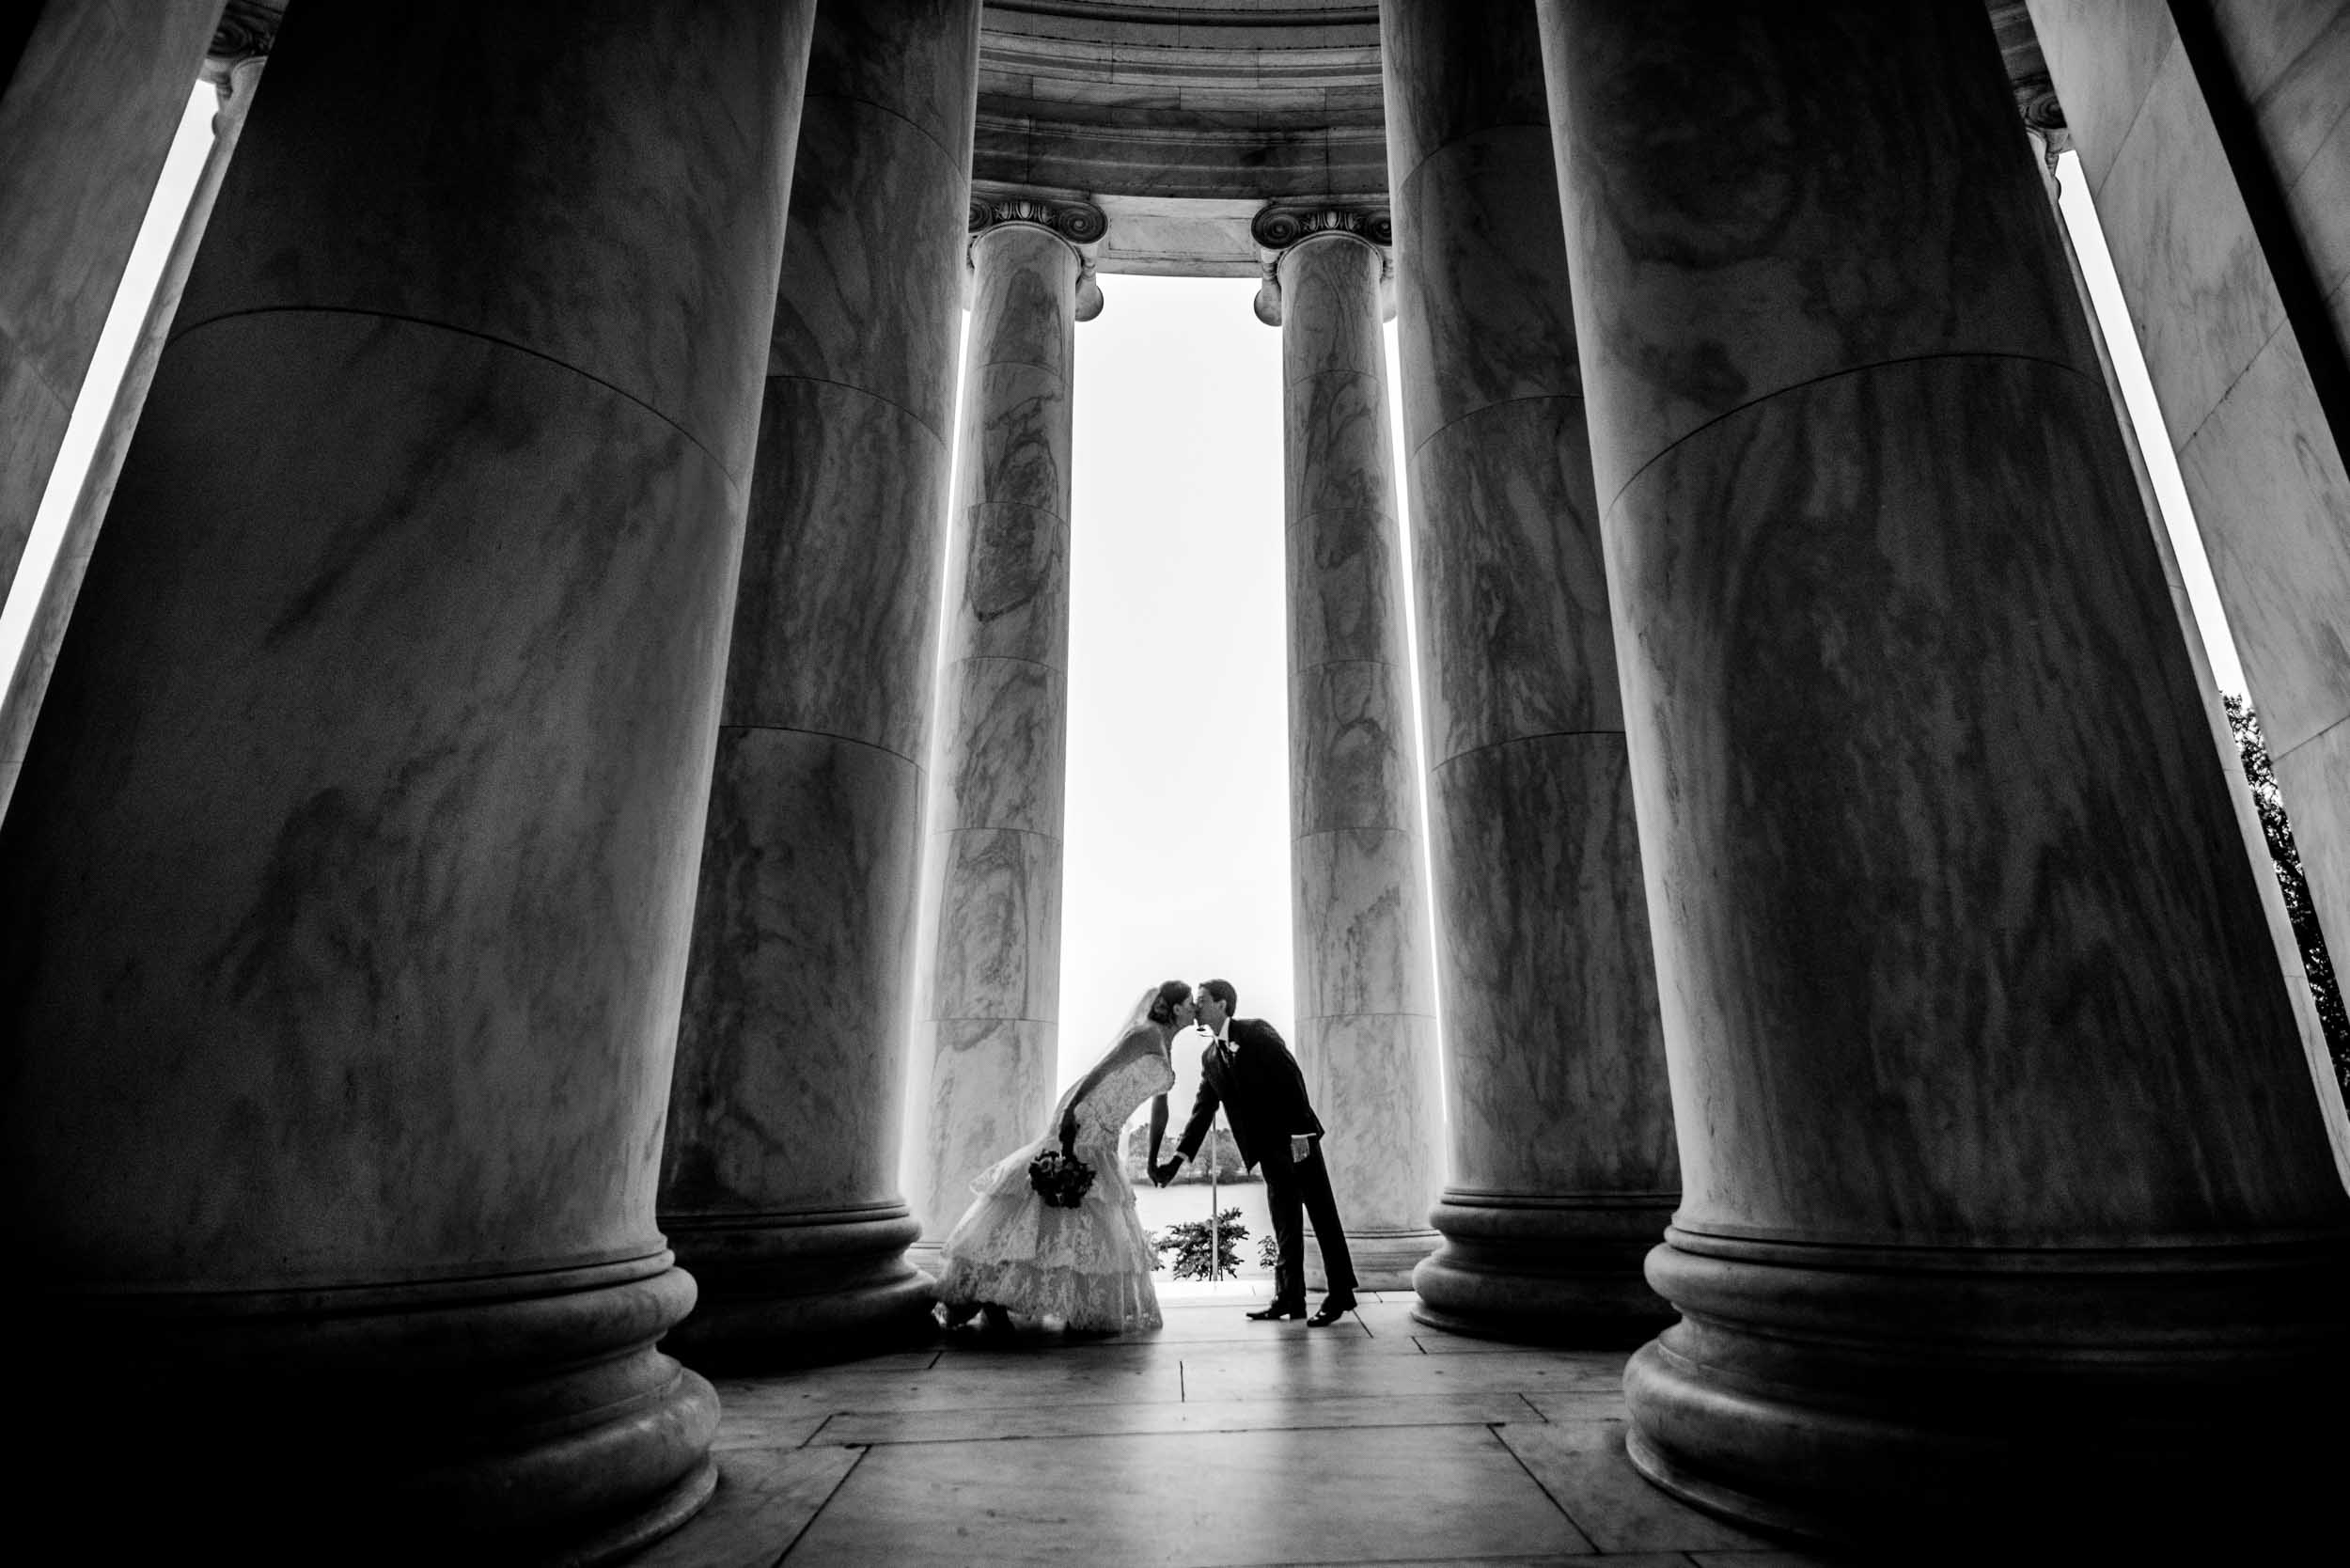 dc+metro+wedding+photographer+vadym+guliuk+photography+wedding+bride+and+groom-2038.jpg